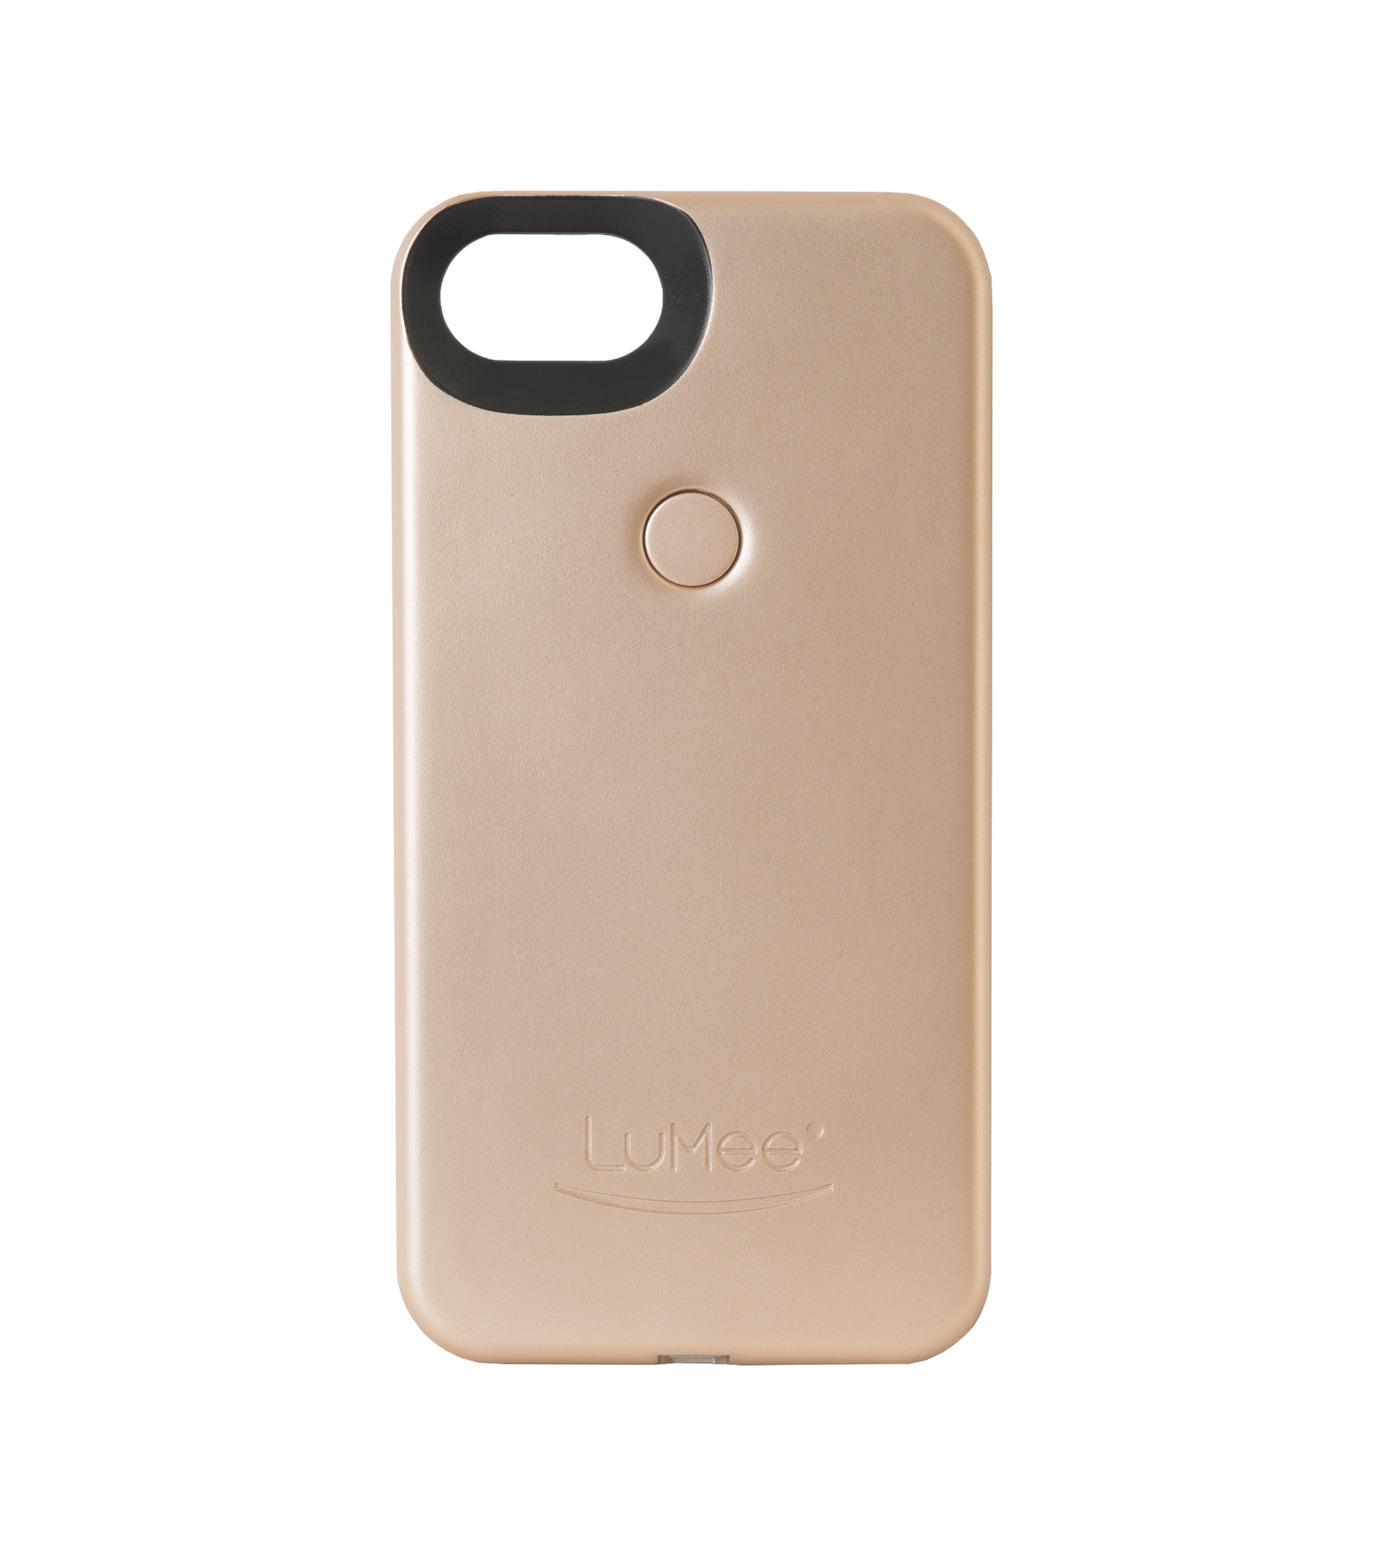 LuMee(ルーミー)のLuMee two iPhone 6/6s/7 - Gold Matte-GOLD(ケースiphone7/7plus/case iphone7/7plus)-L2-IP7-GOLDM-2 拡大詳細画像1